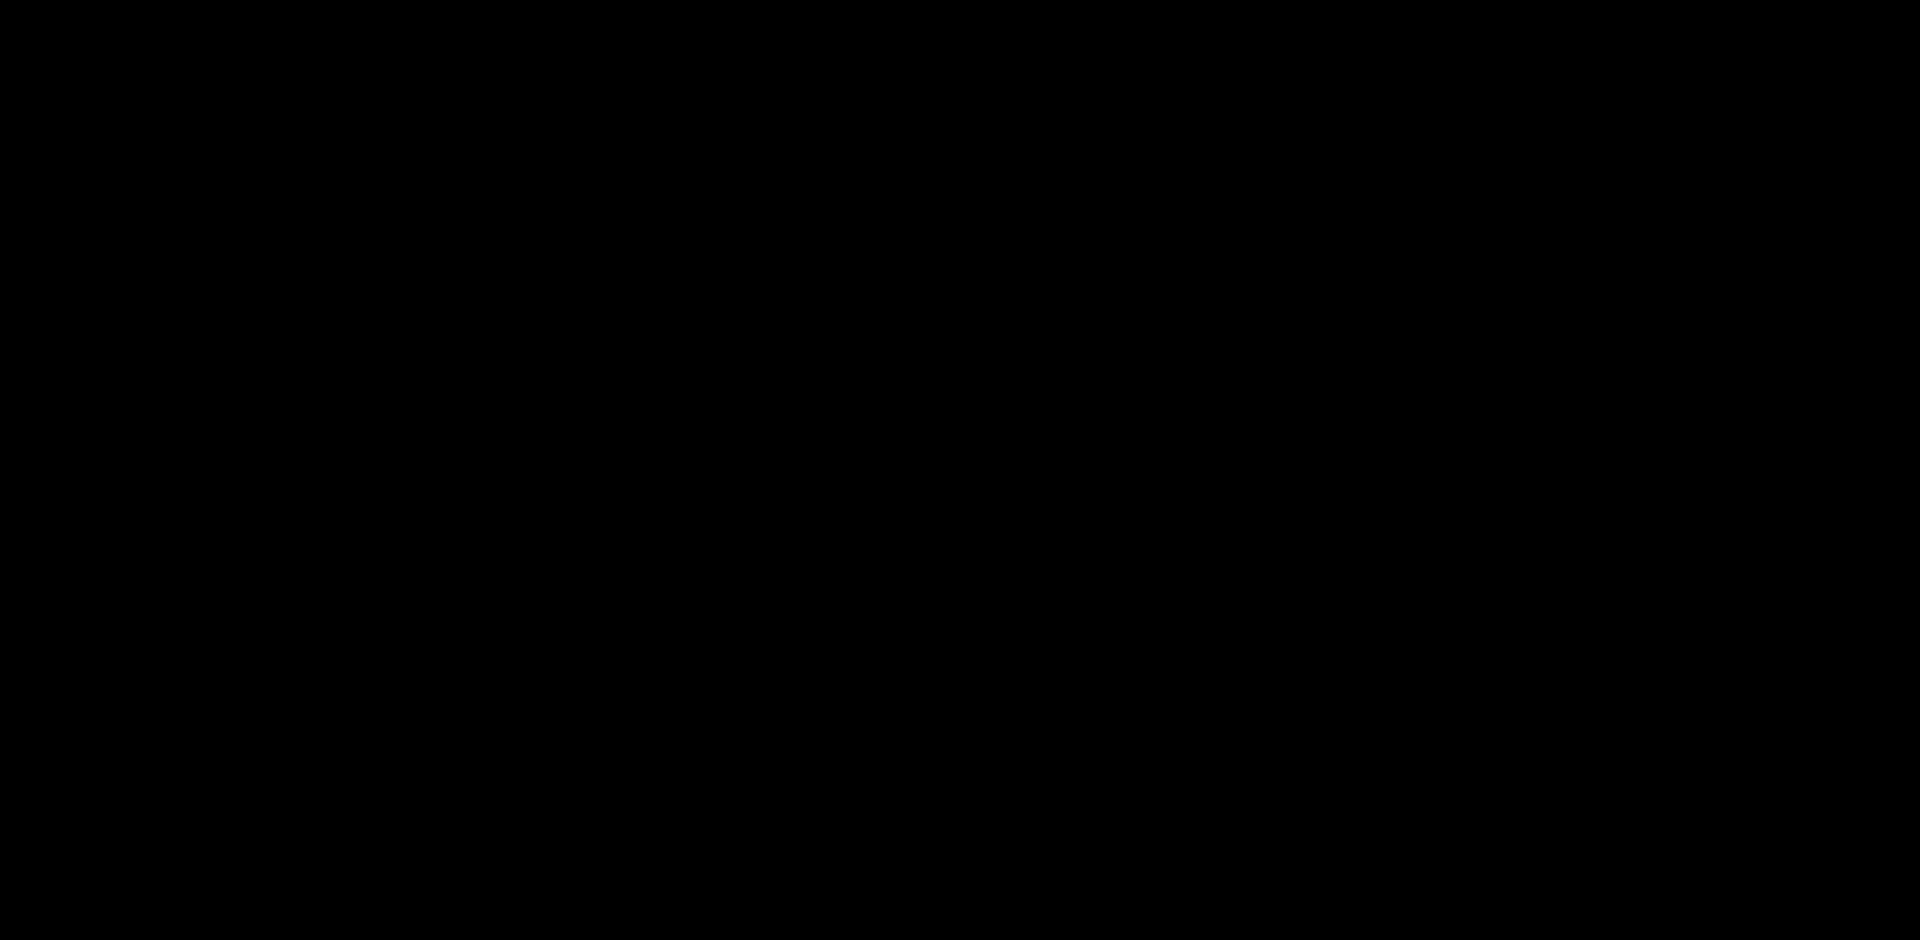 RODENO_Amb02_Web.jpg